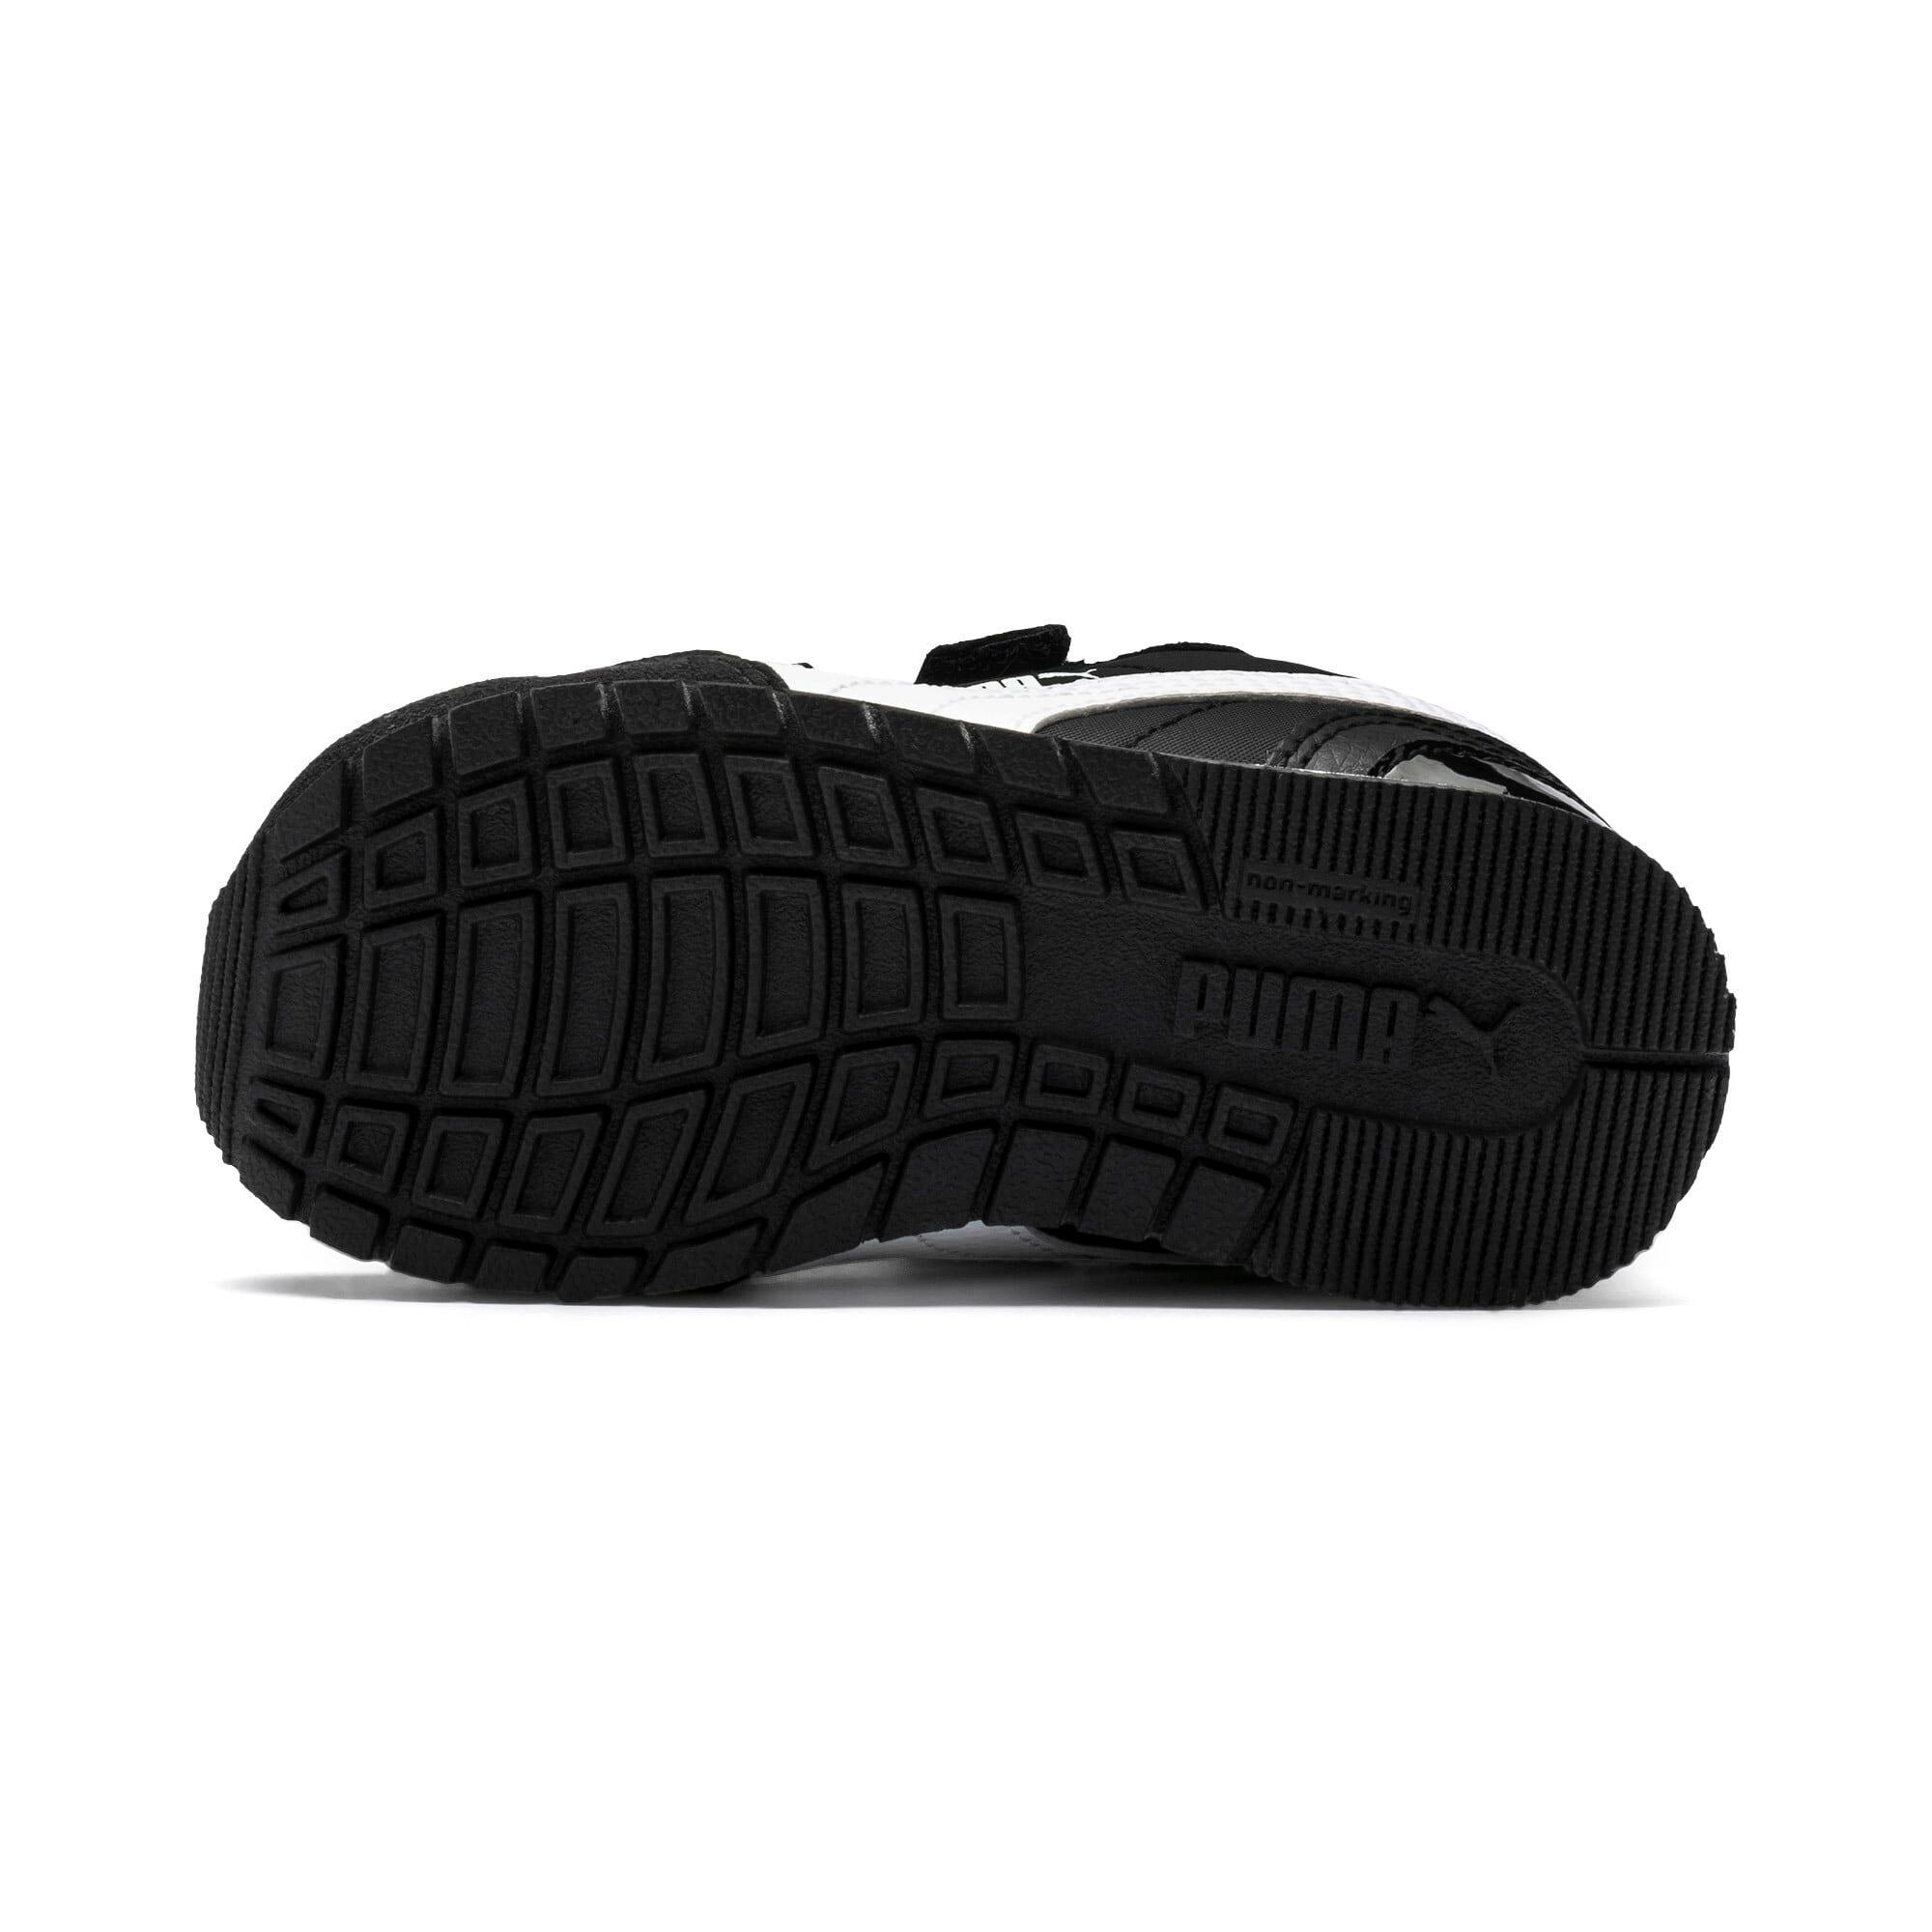 Thumbnail 4 of ST Runner v2 Little Kids' Shoes, Puma Black-Puma White, medium